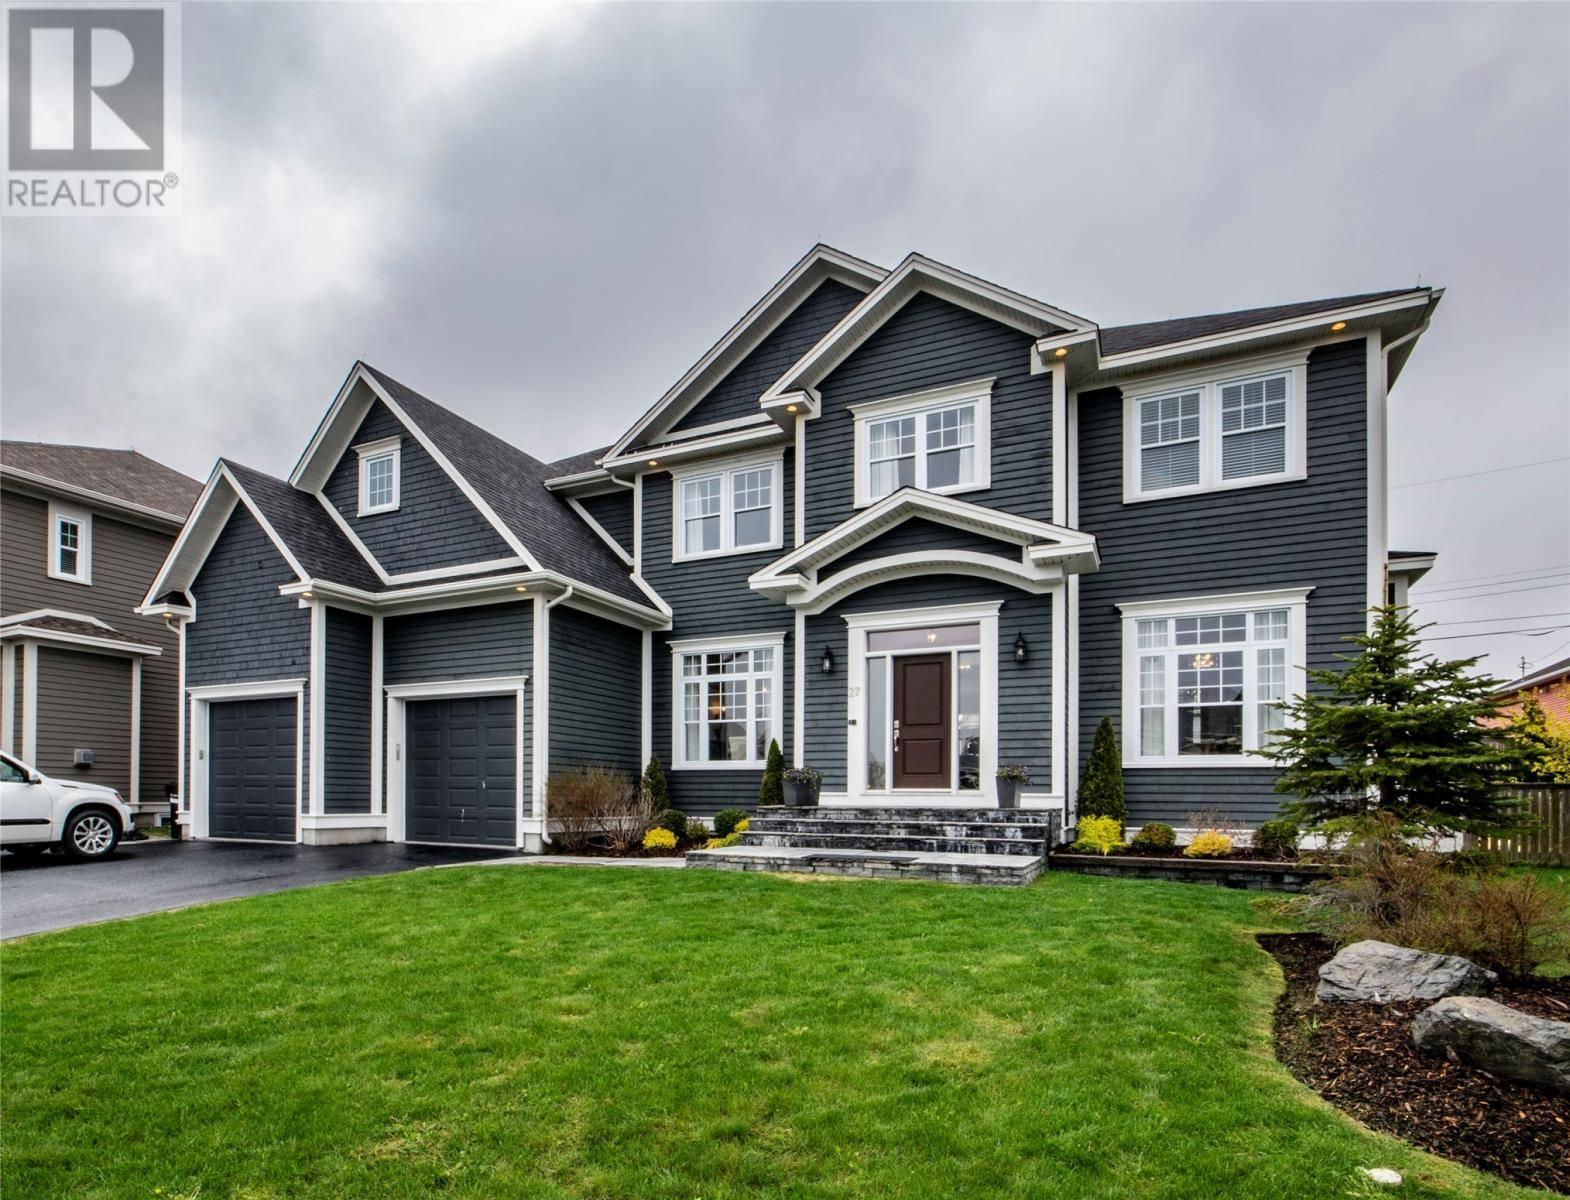 House for sale at 27 Stonebridge Pl St. John's Newfoundland - MLS: 1197669